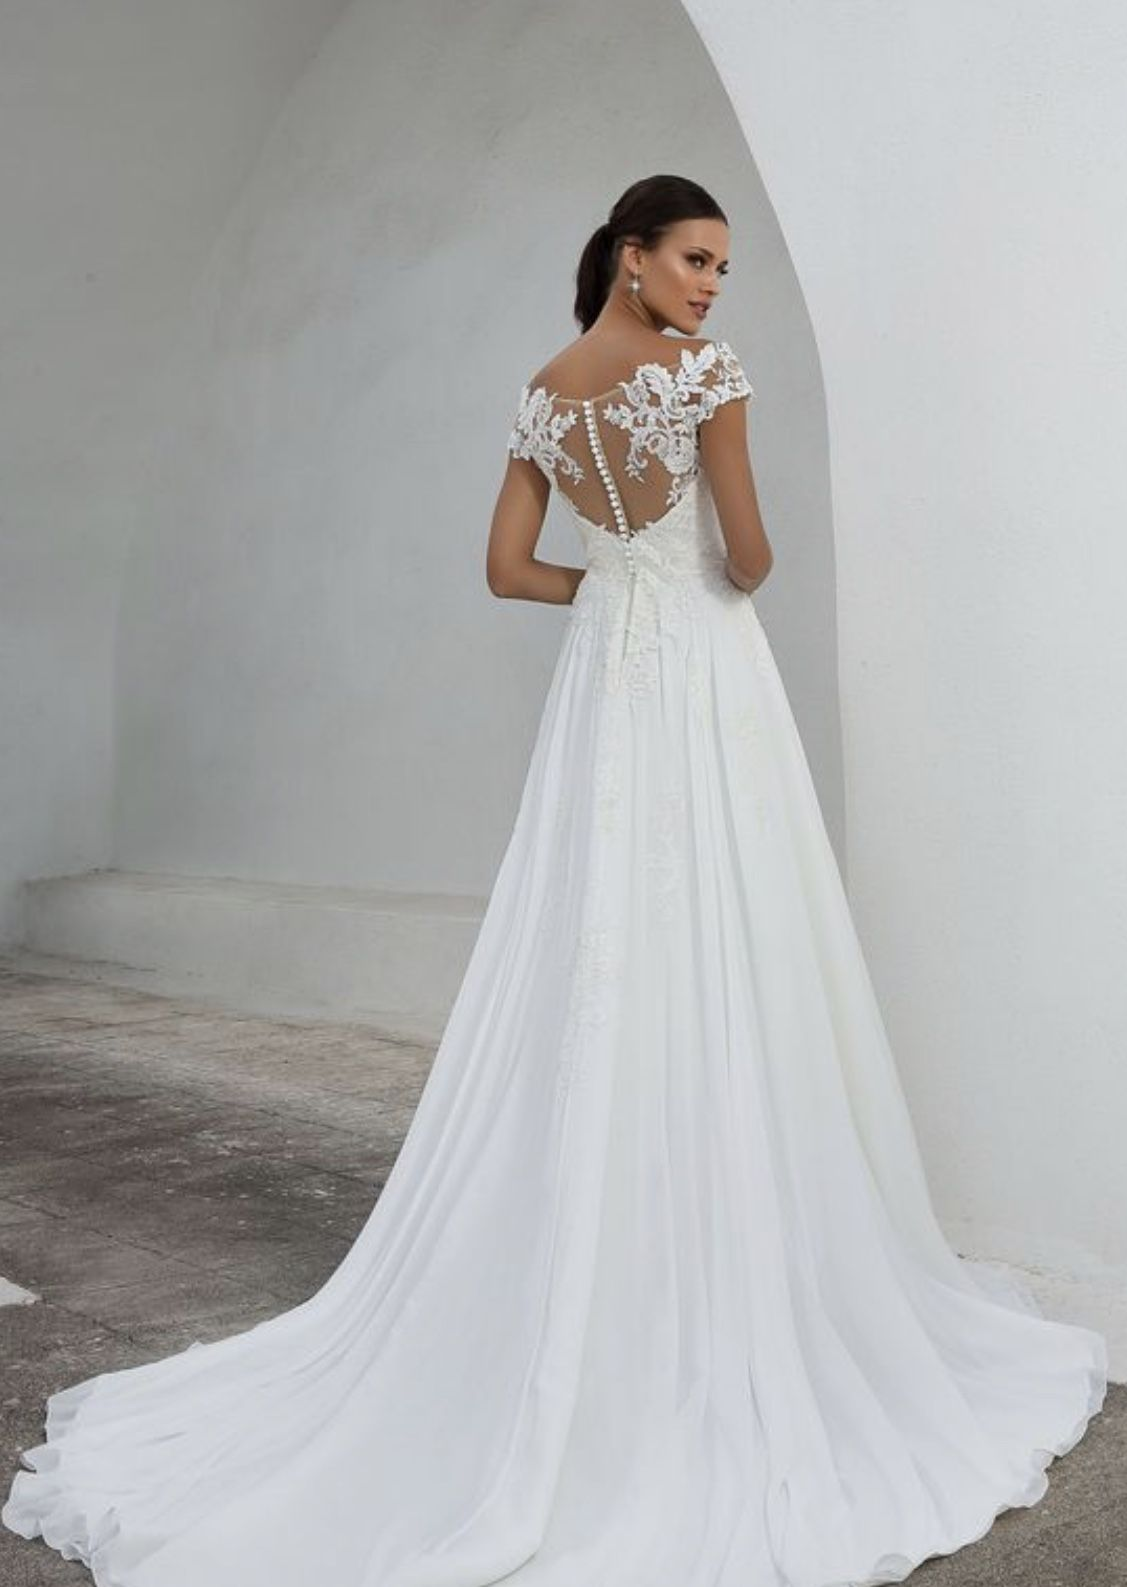 Pin By Gracyn Elizabeth Bride On Simple Silhouettes Justin Alexander Bridal Justin Alexander Wedding Dress Wedding Dress Silhouette Guide [ 1587 x 1127 Pixel ]